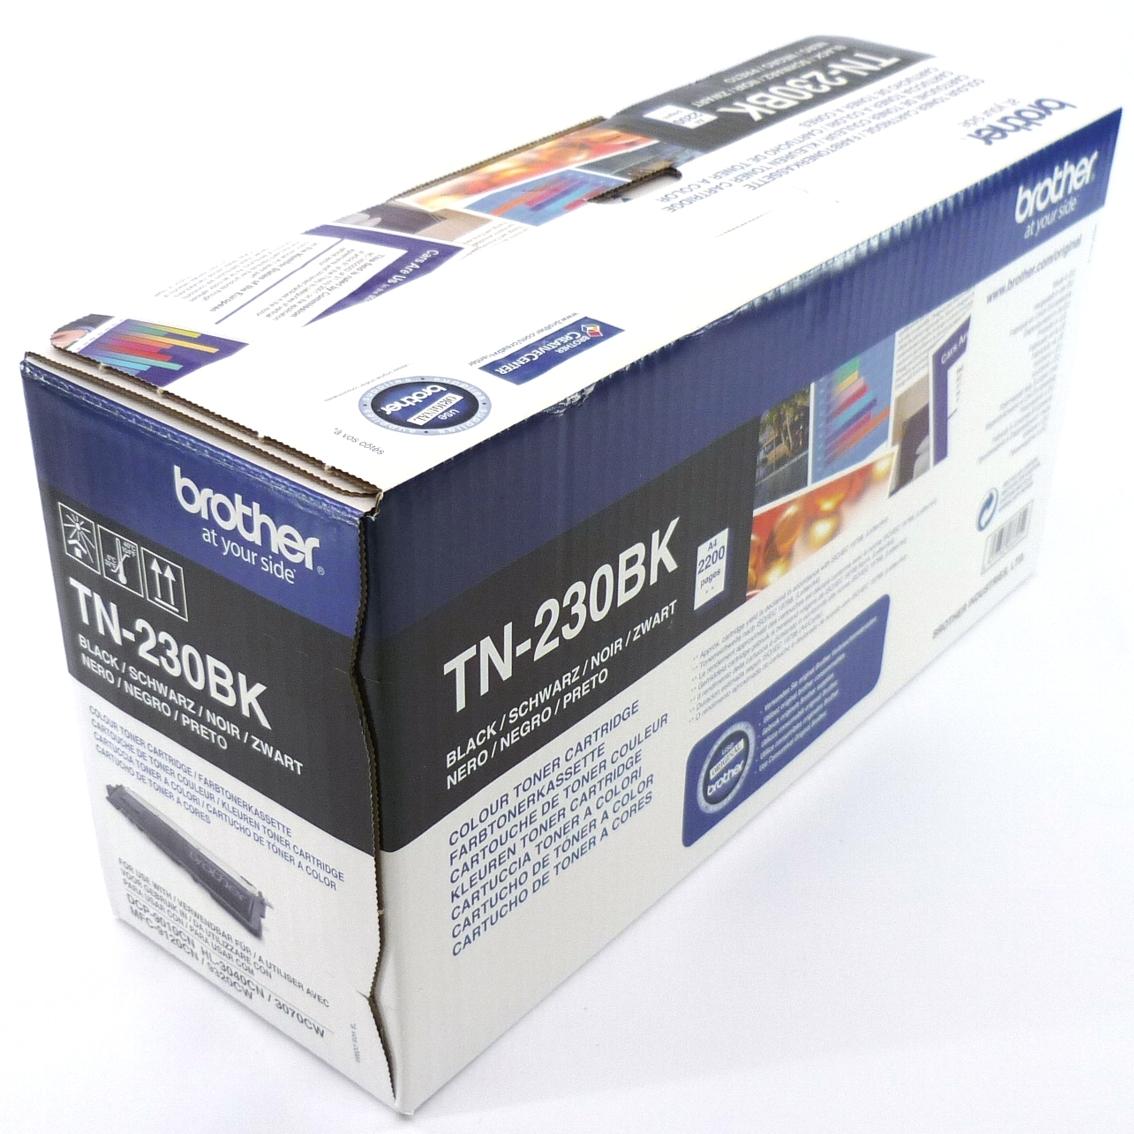 original brother tn 230bk schwarz dcp9010cn hl3040cn 3070cw mfc9120 mit rechnung ebay. Black Bedroom Furniture Sets. Home Design Ideas